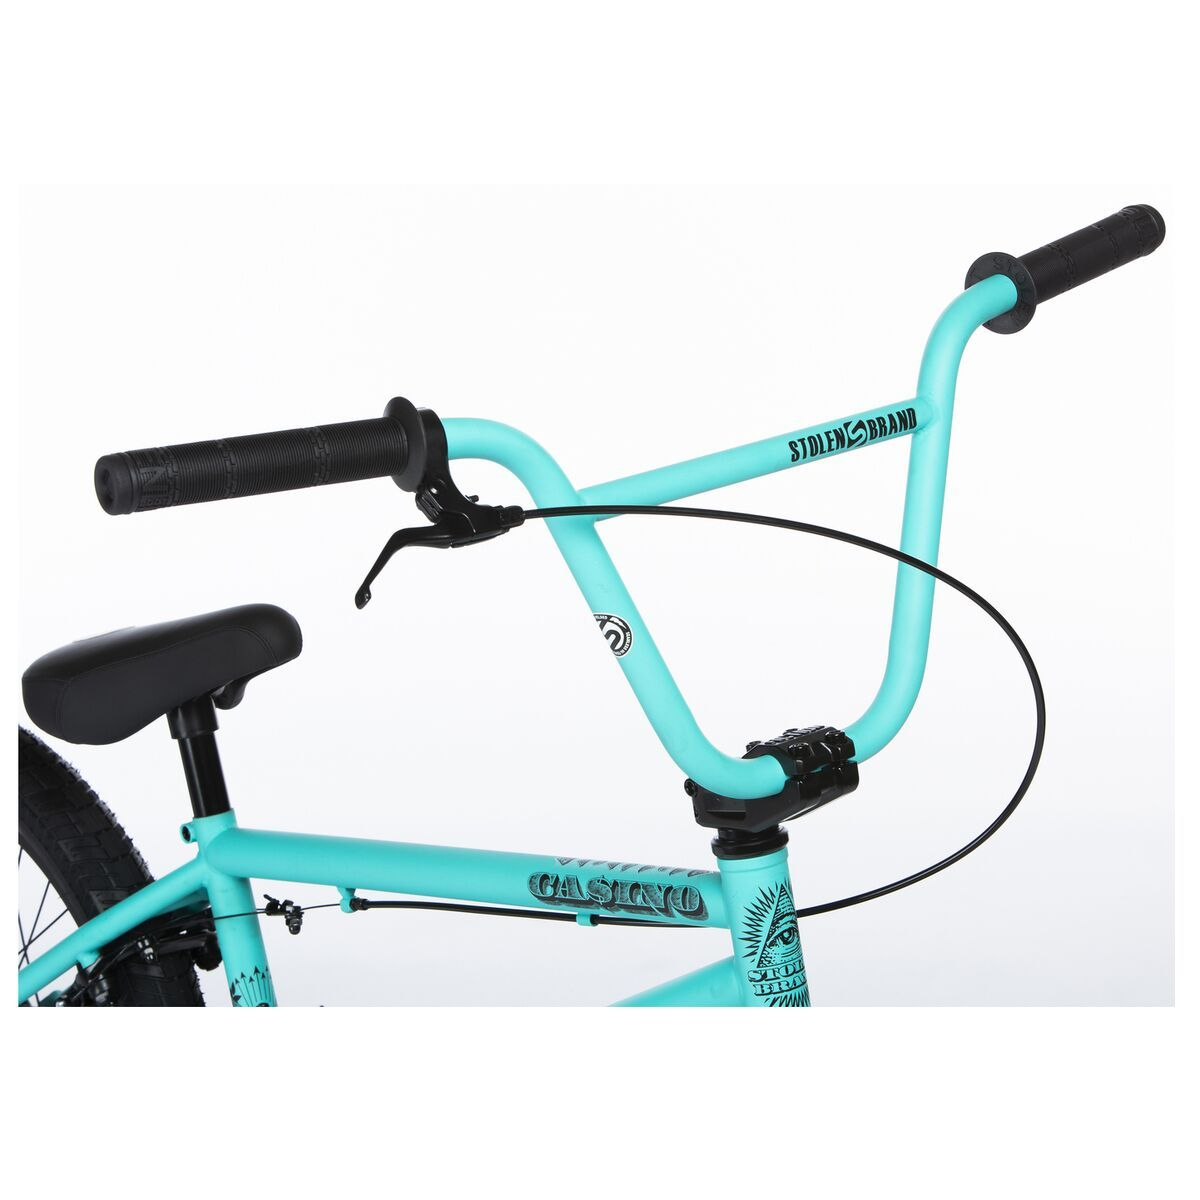 Bicycle casino 2.0 nhra drag racing 2 game download